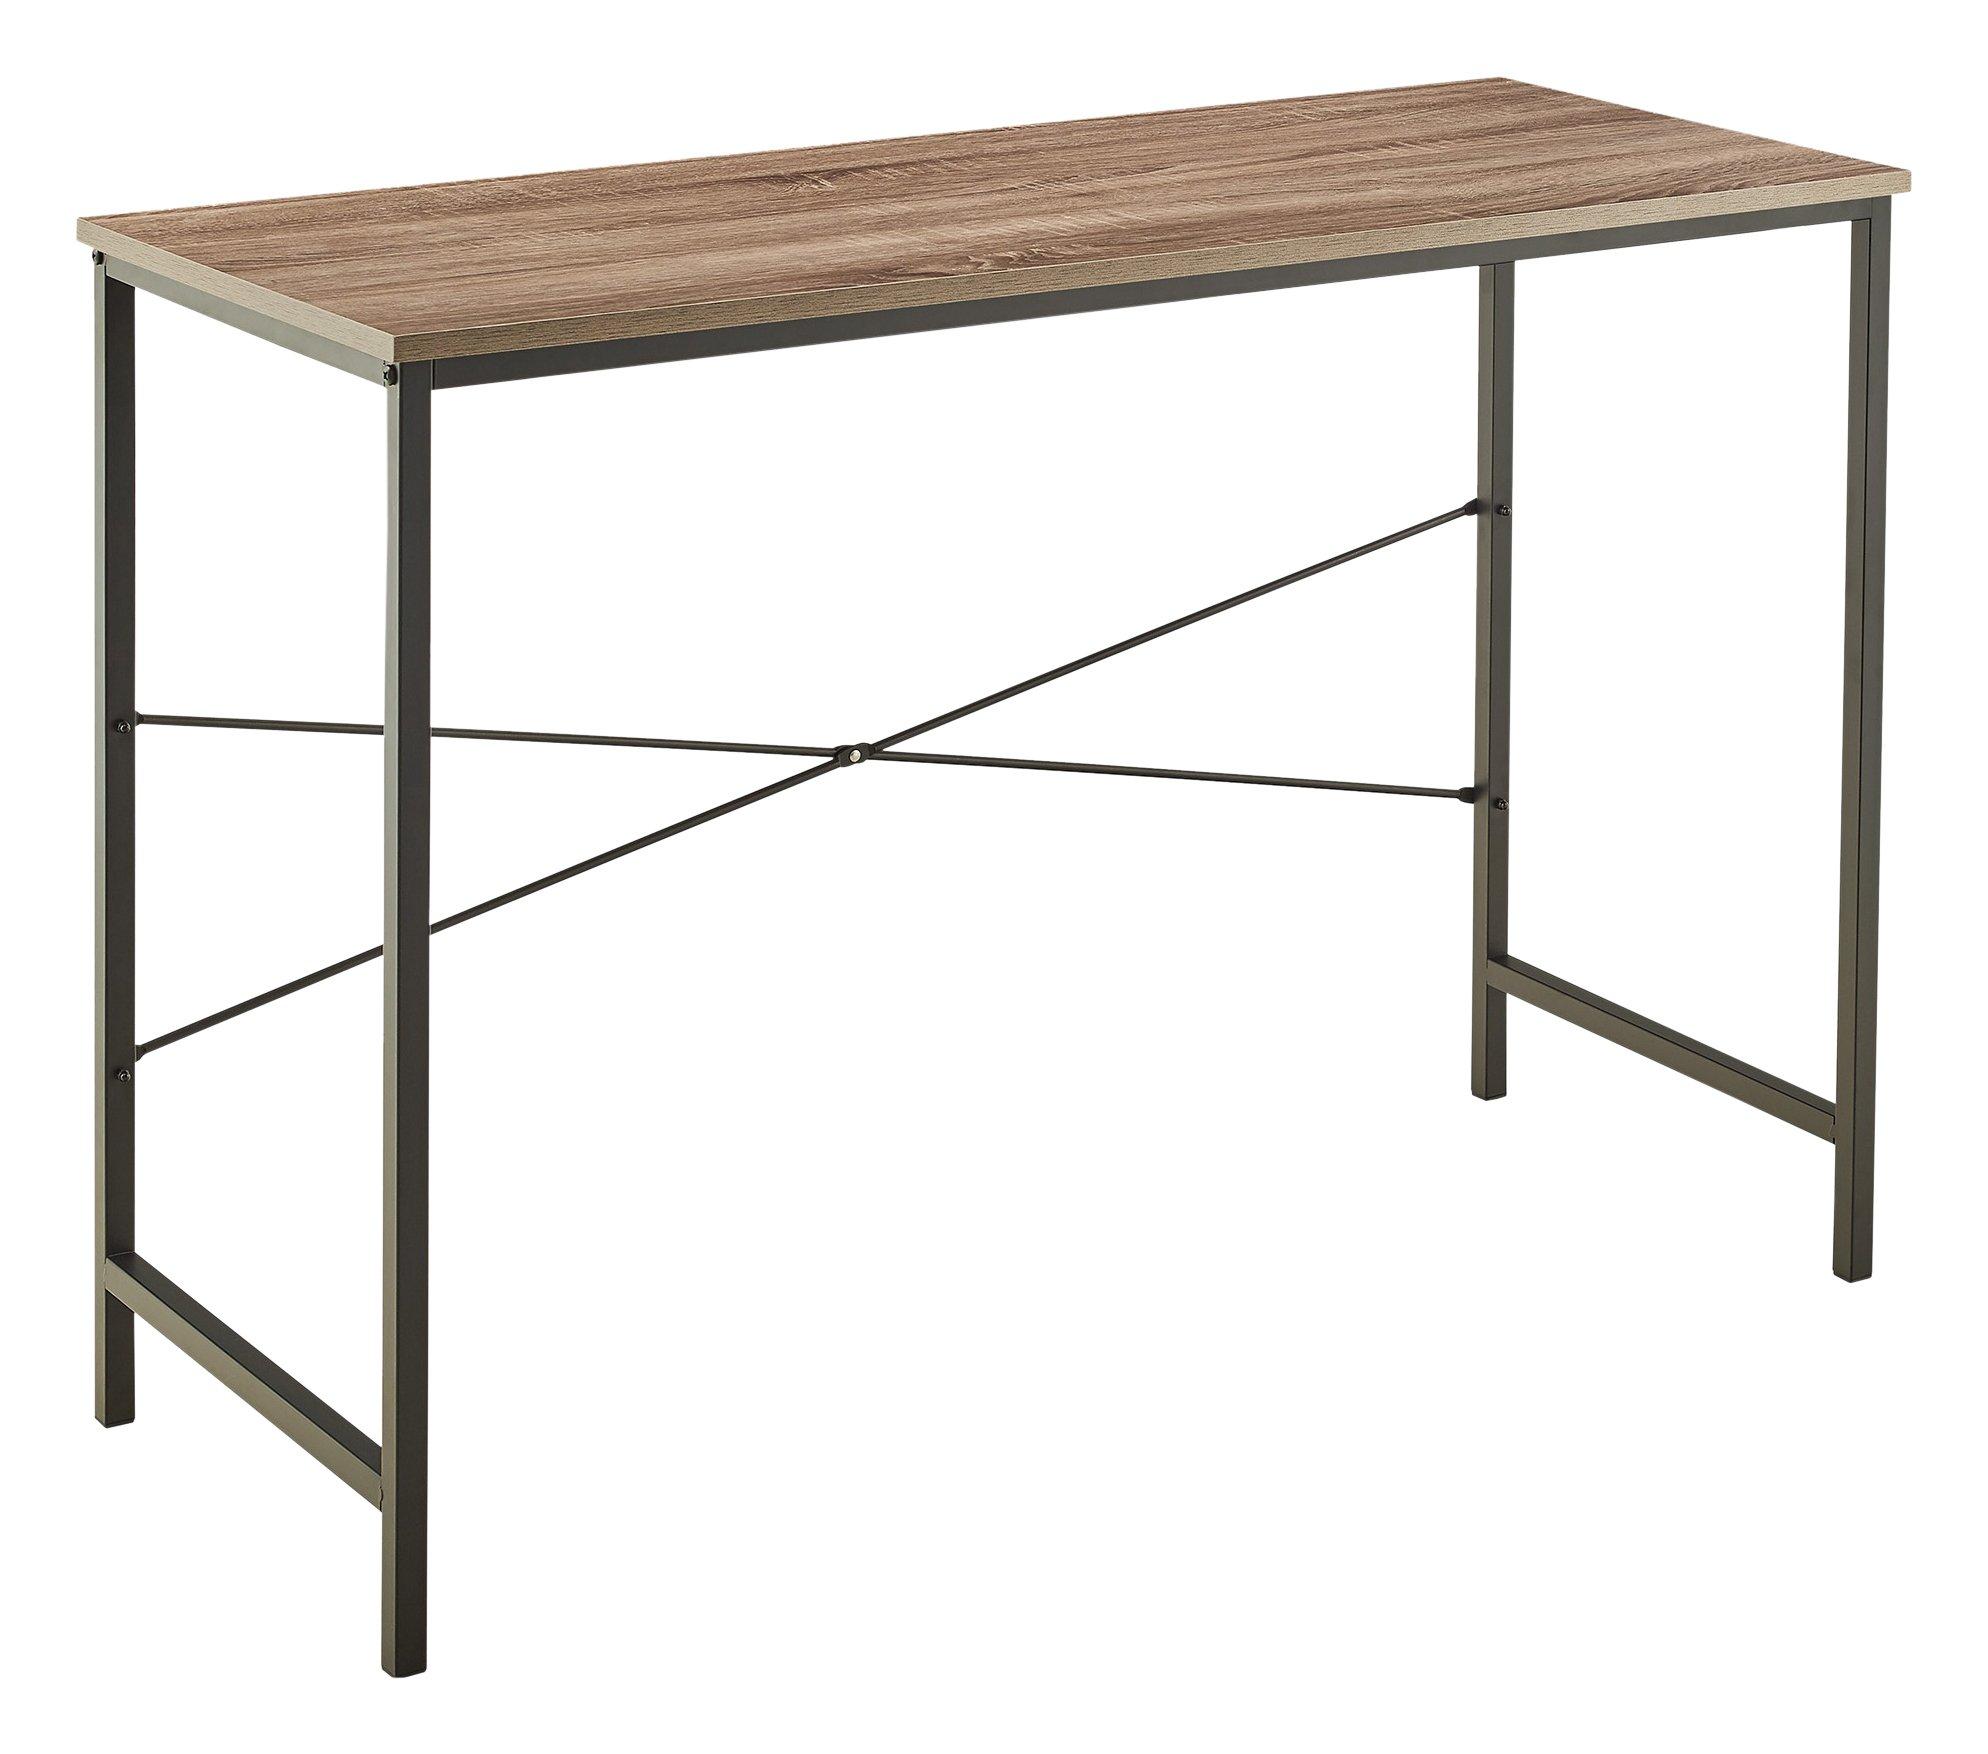 ClosetMaid 1317 Rectangular Wood Desk, Gray by ClosetMaid